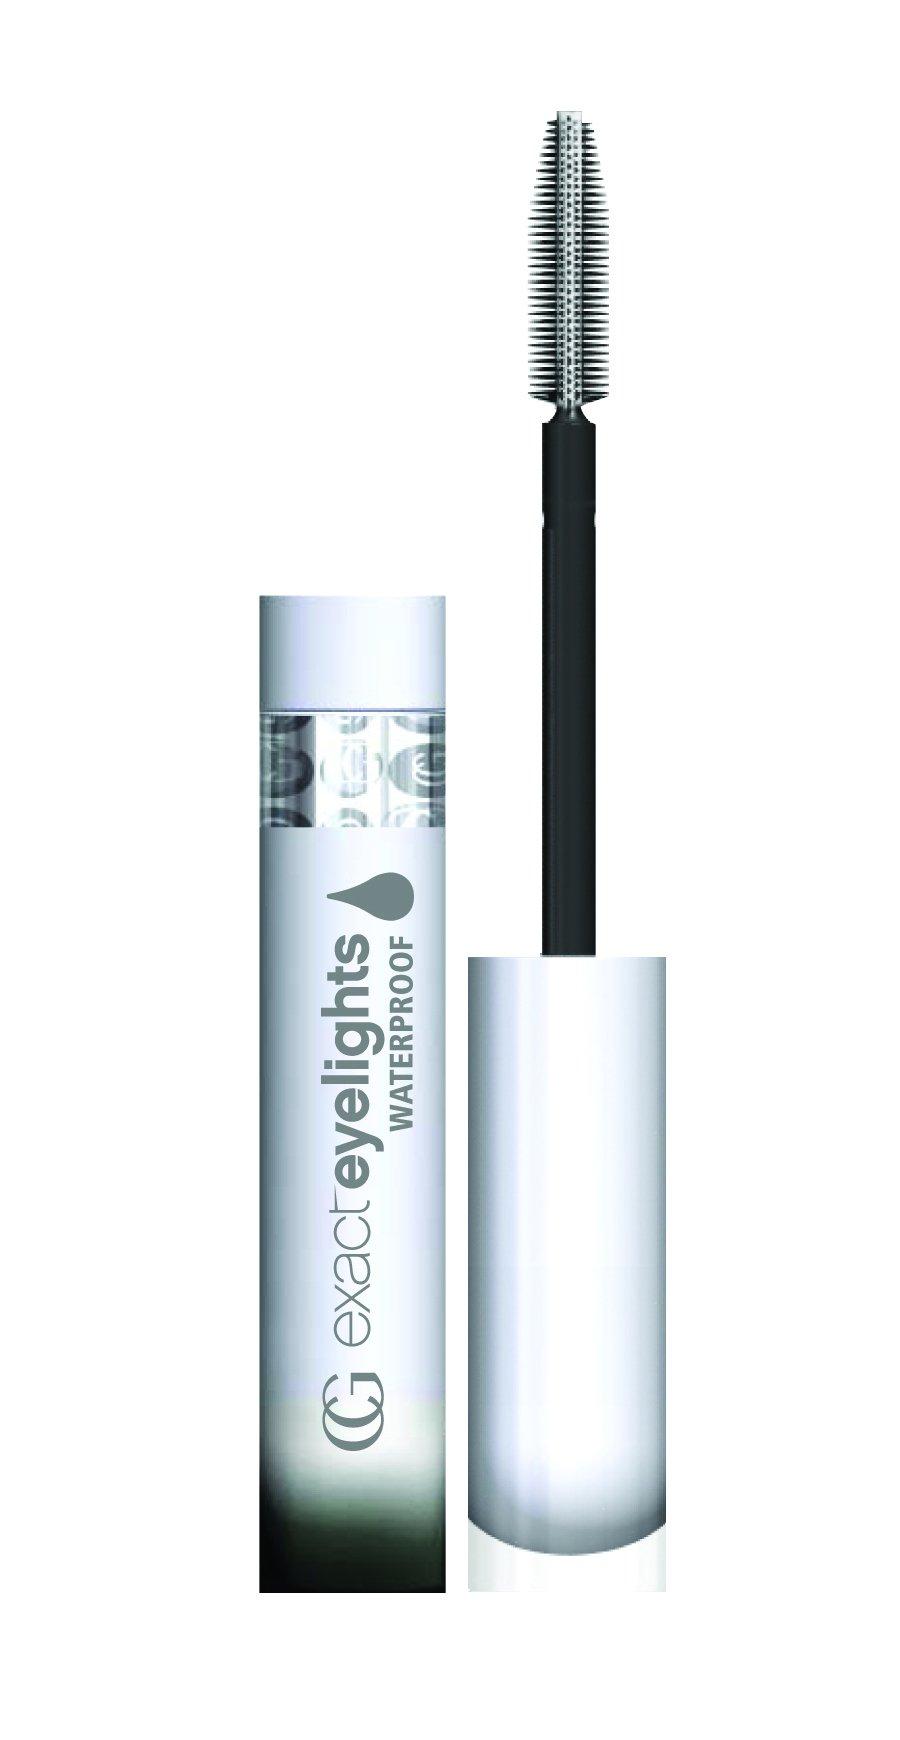 COVERGIRL Exact Eyelights Waterproof Mascara Black Pearl for Brown Eyes 730, .24 oz by COVERGIRL